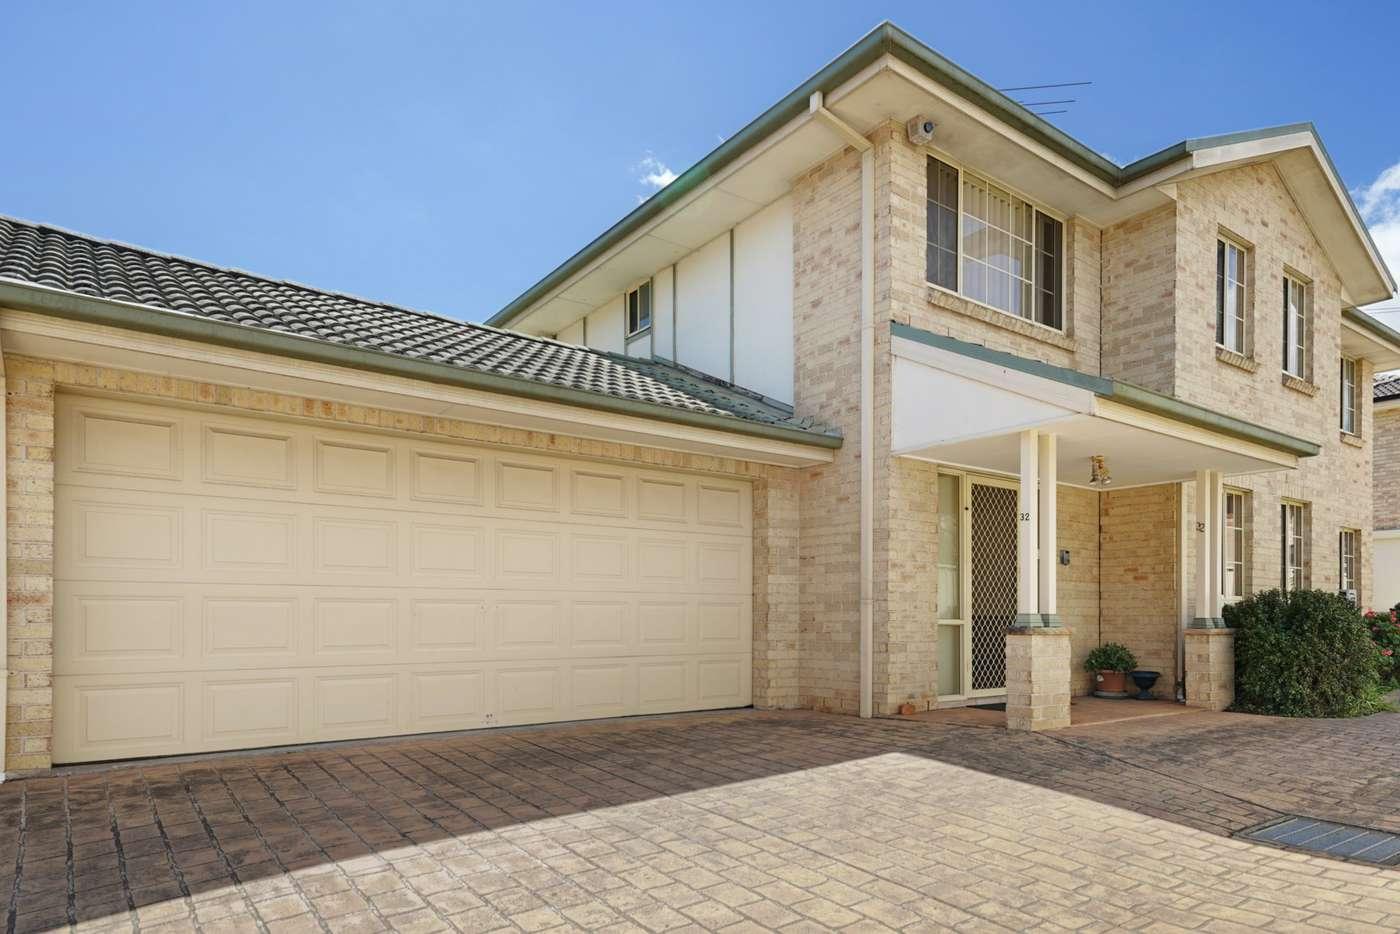 Main view of Homely house listing, 32 Verbena Avenue, Casula NSW 2170